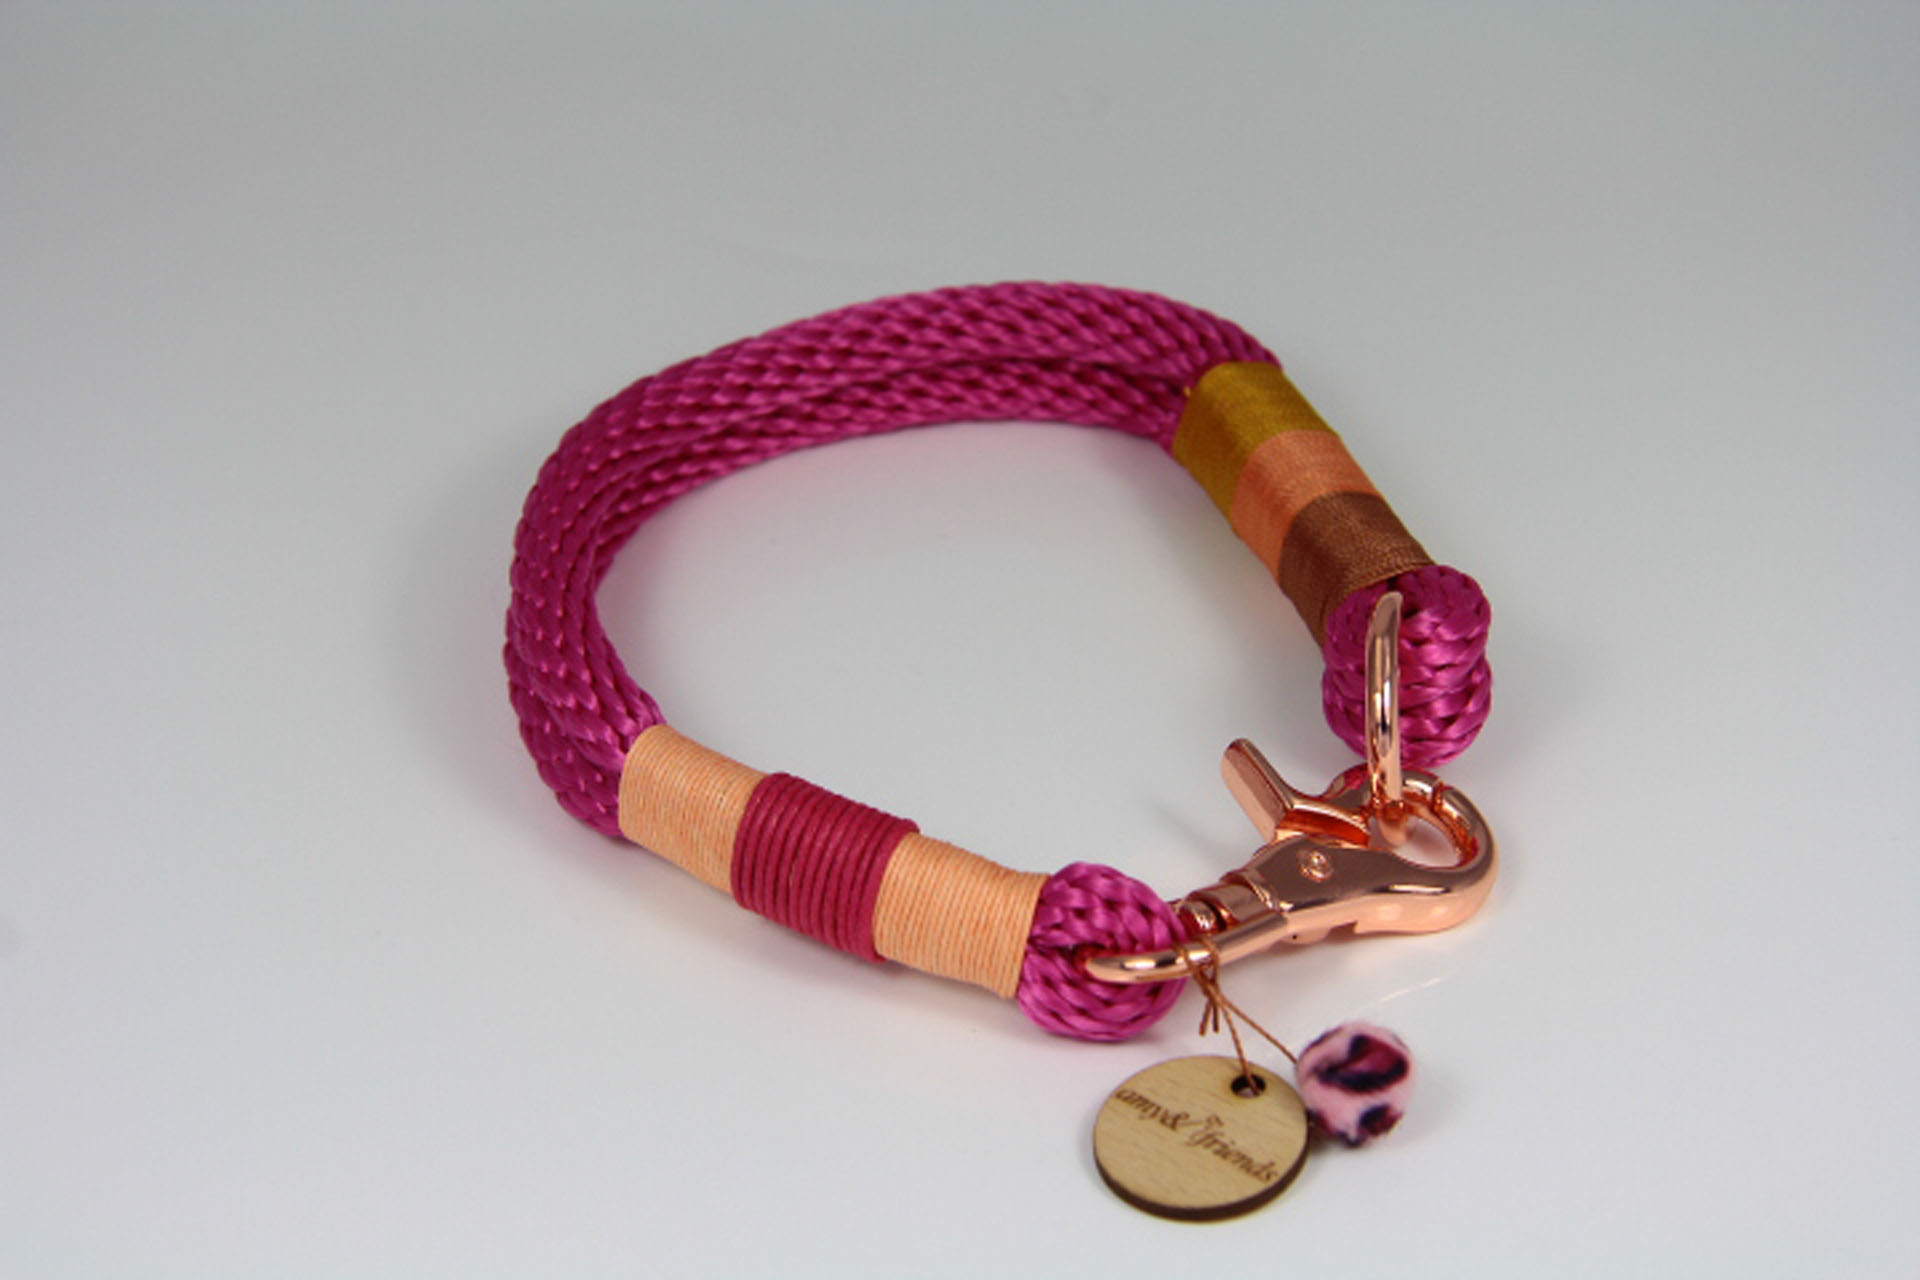 Tauhalsband-amy-and-friends-fuchsia-chocolate-peach-goldbraun